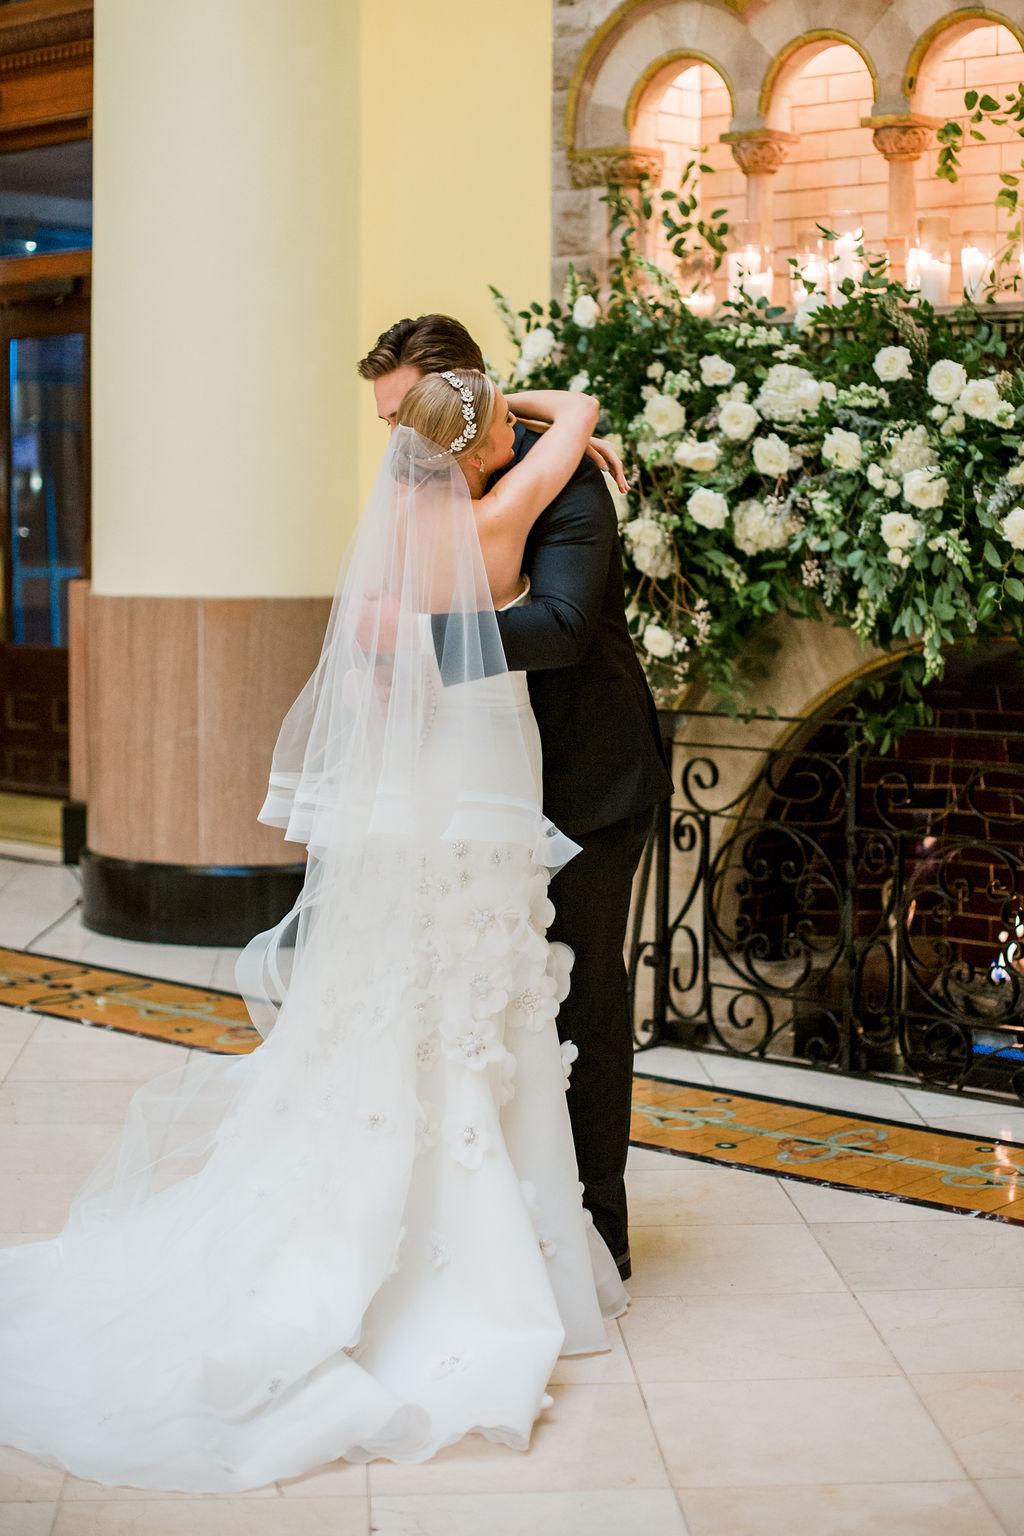 Wedding first look photo: Lavish Union Station Hotel Wedding featured on Nashville Bride Guide